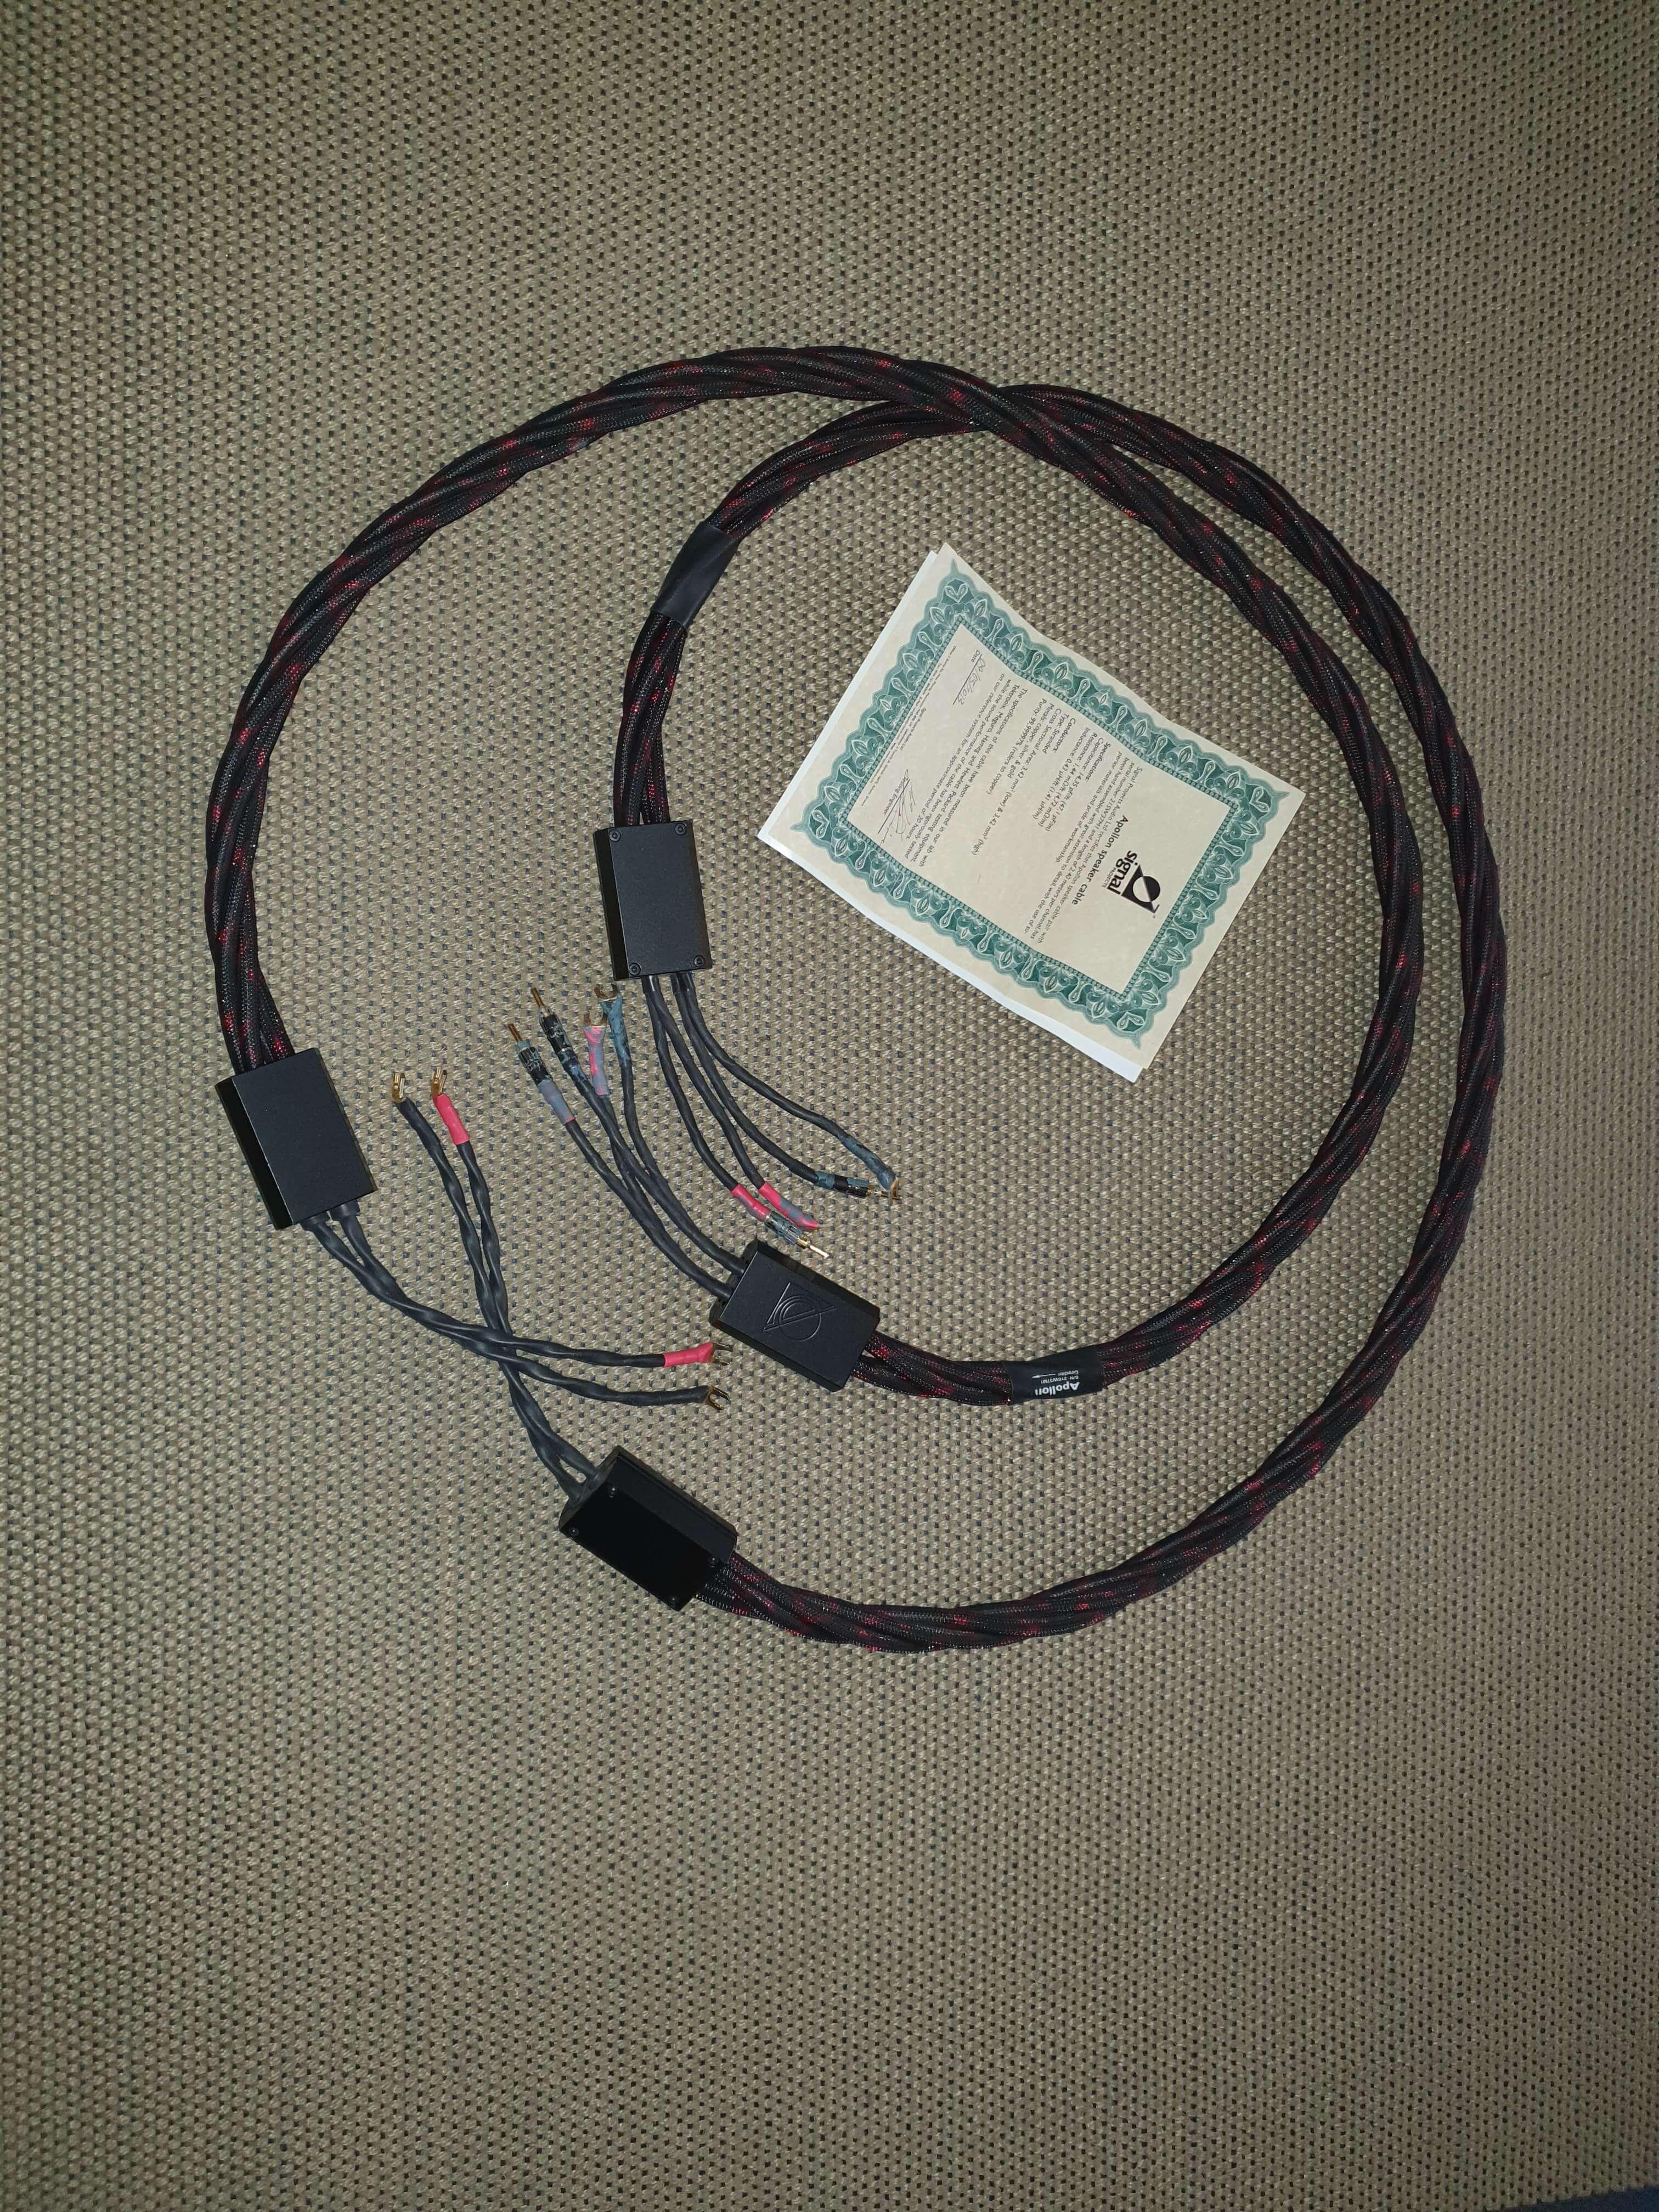 CABLE ENCEINTES SIGNAL PROJECTS AUDIO APOLLON 2x2.4m